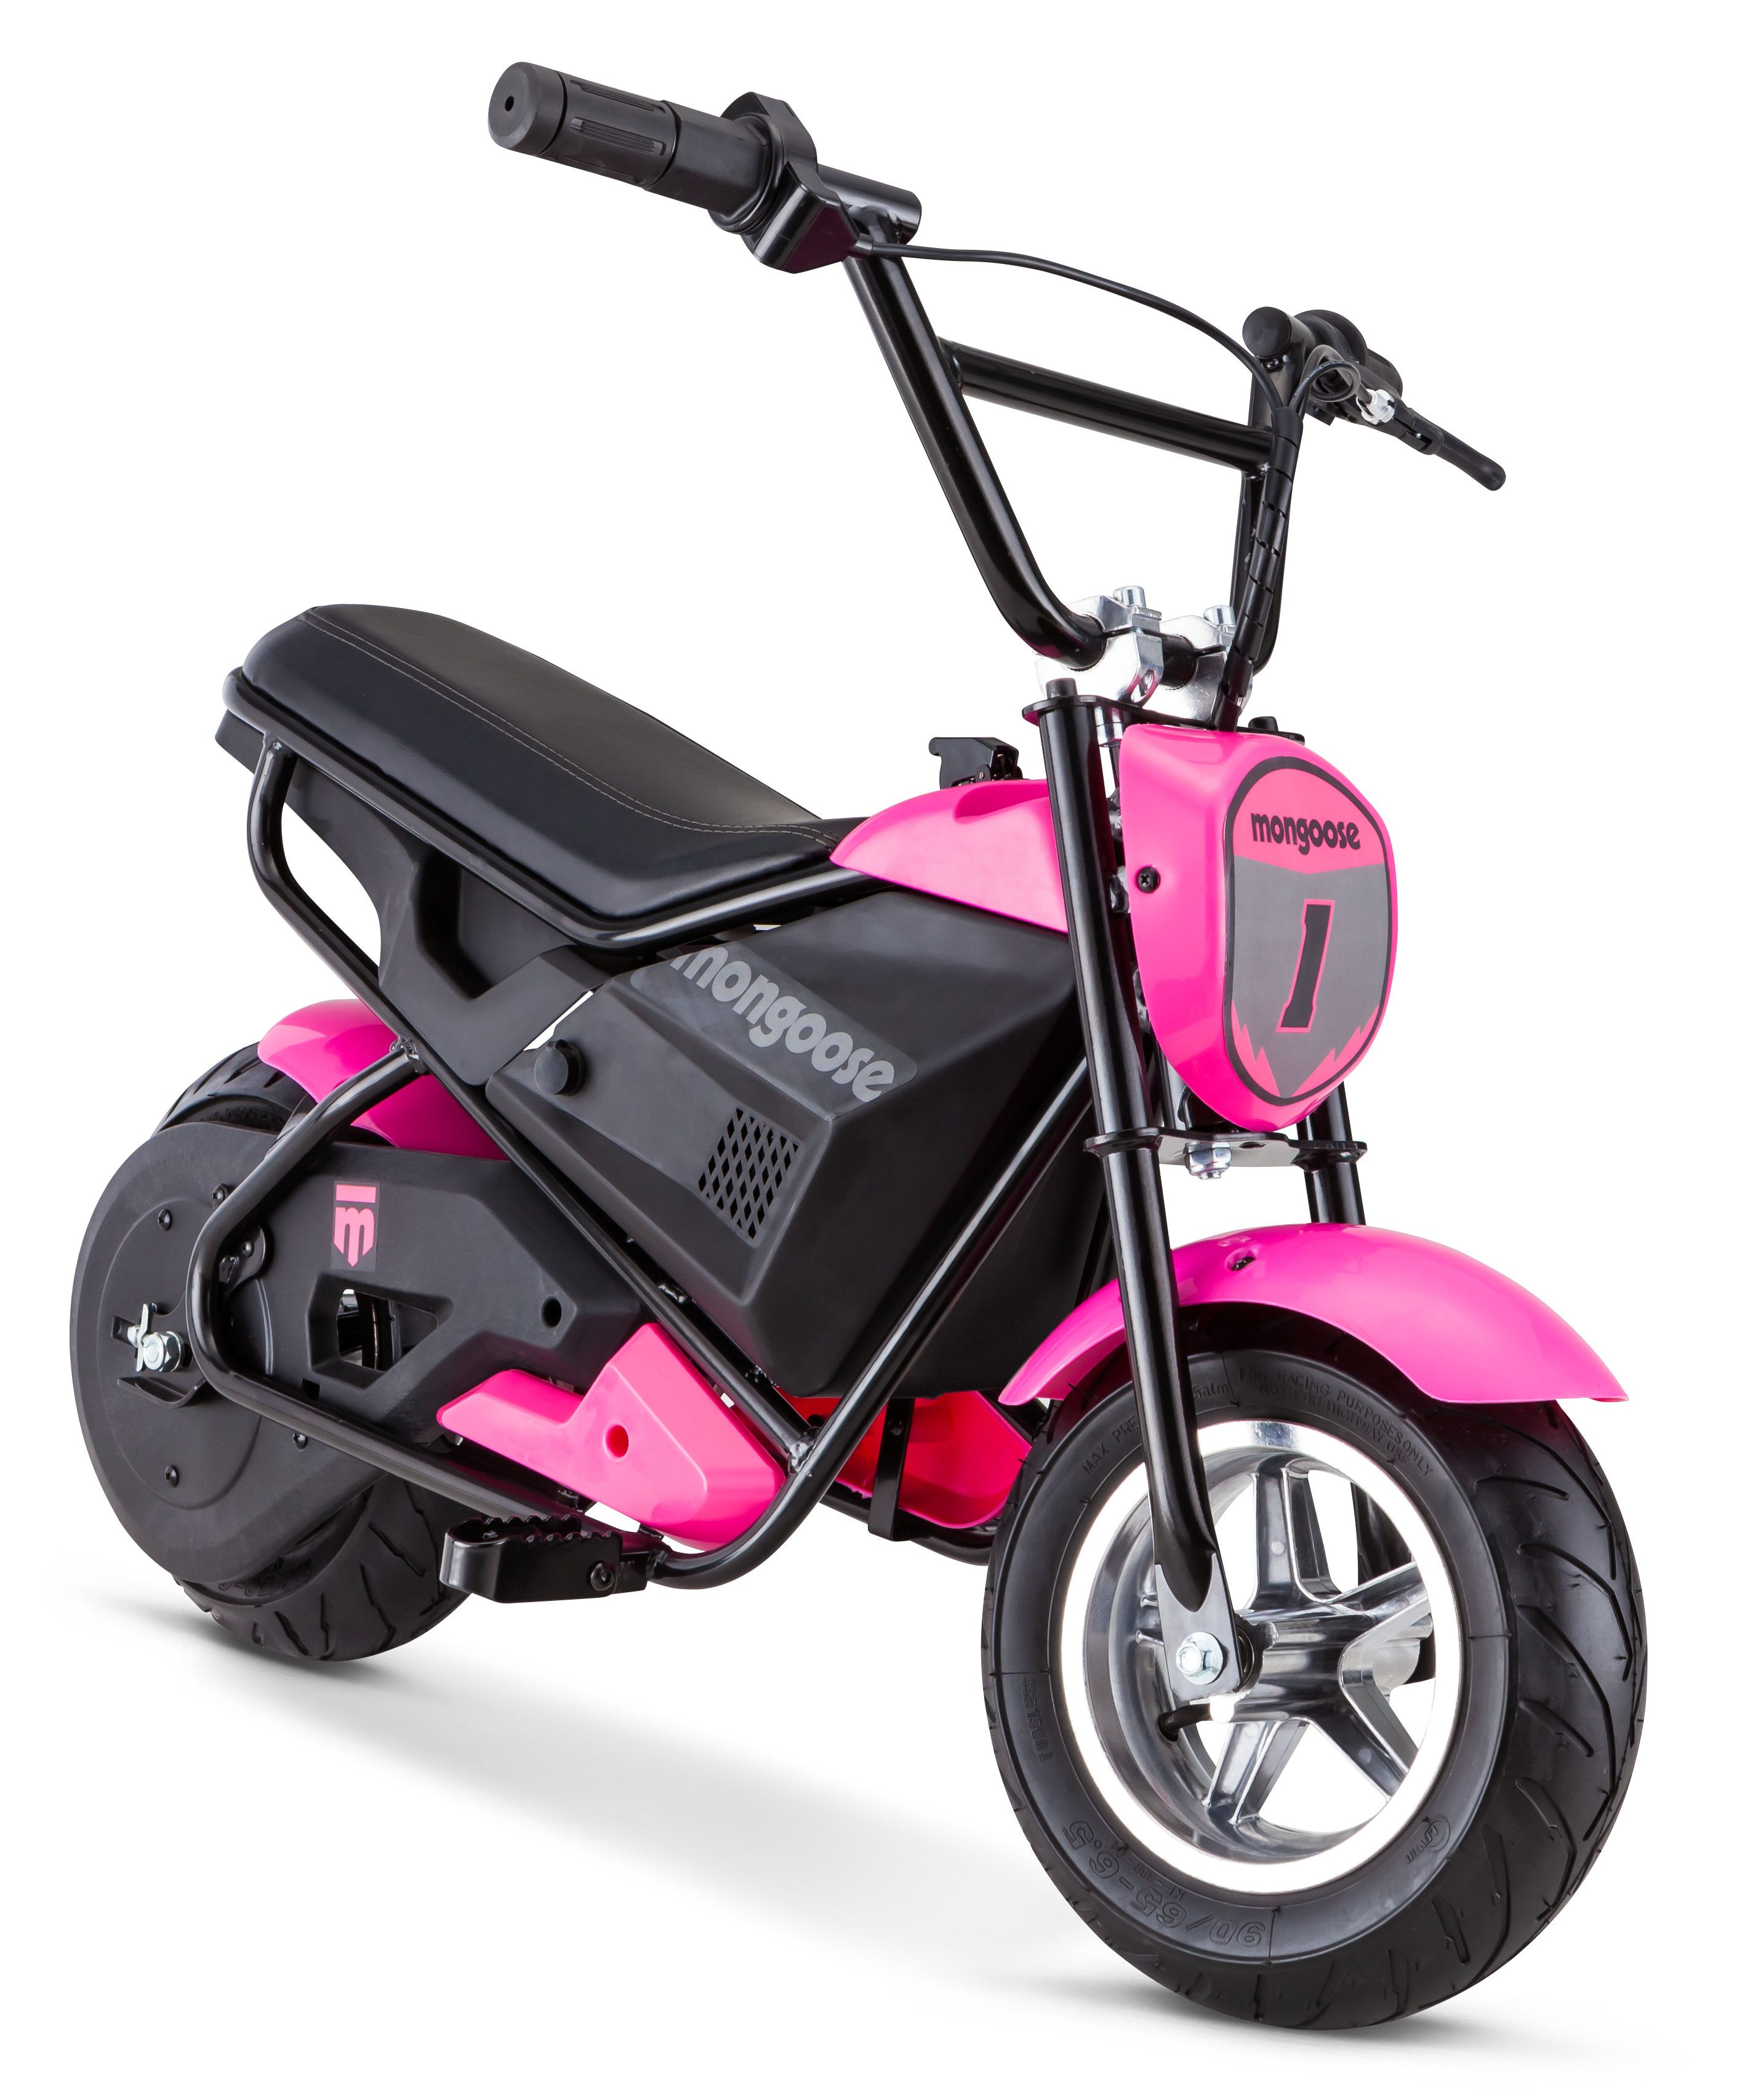 small resolution of mongoose 24 volt powered mini bike pink hondaelectricscooter electricbikeforkids tvsbike jawabike